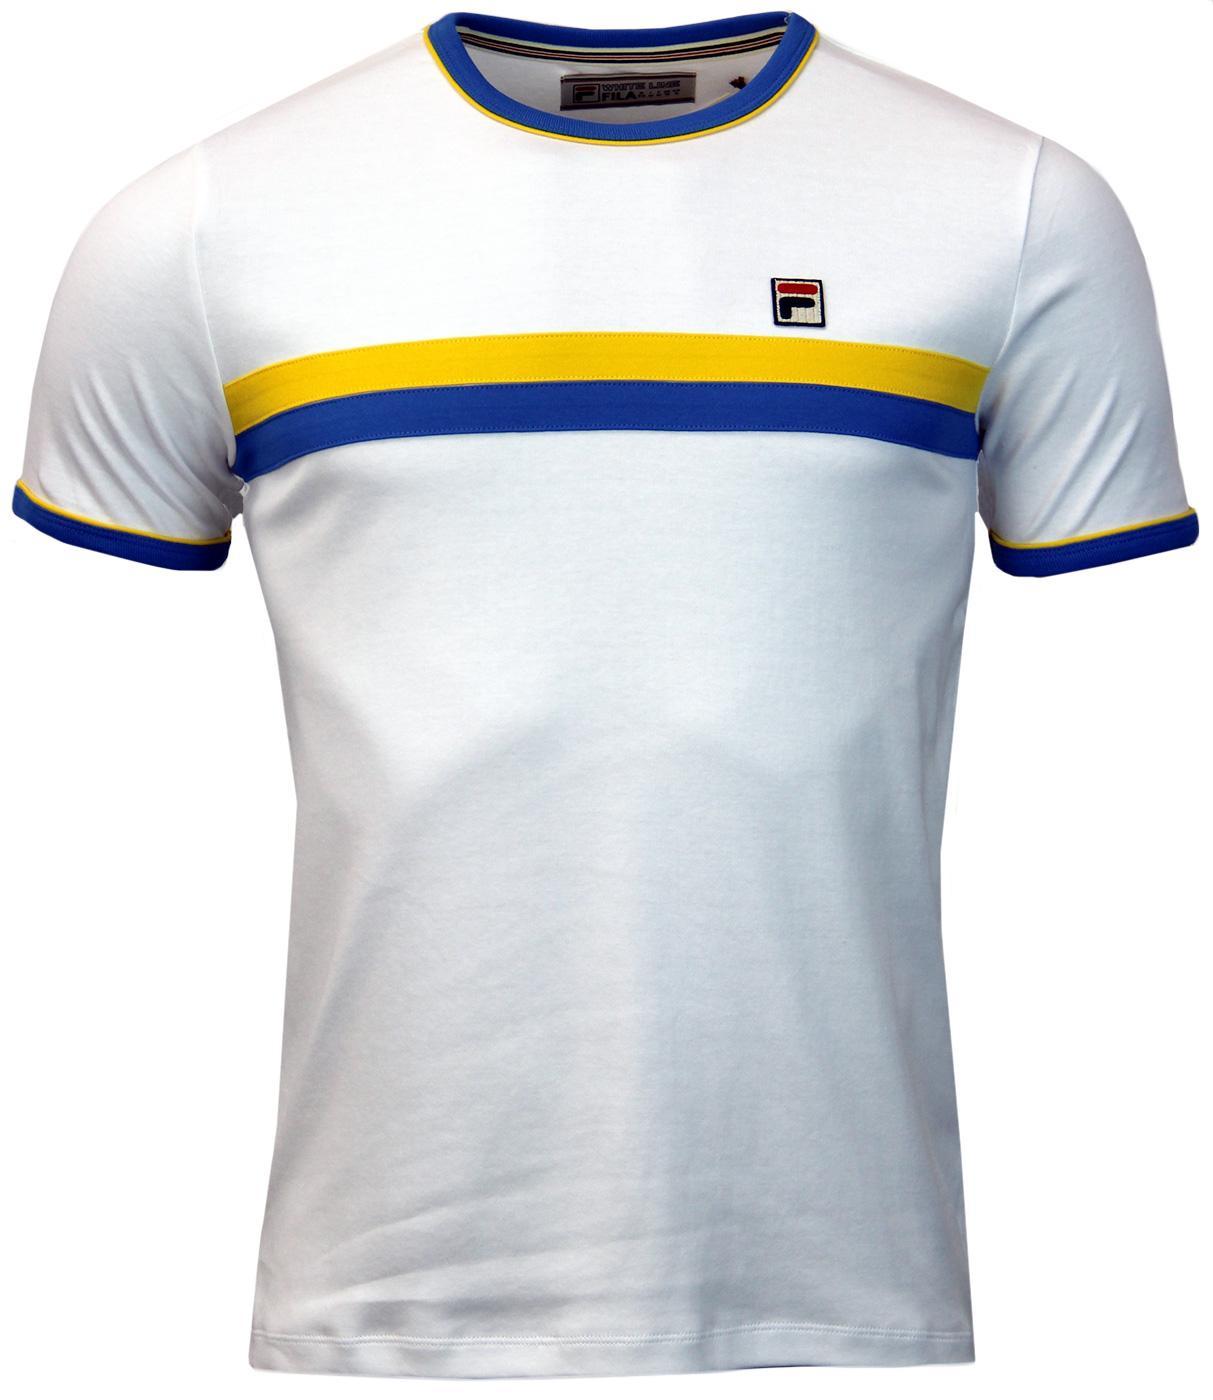 Razee FILA VINTAGE Seventies Chest Stripe T-Shirt